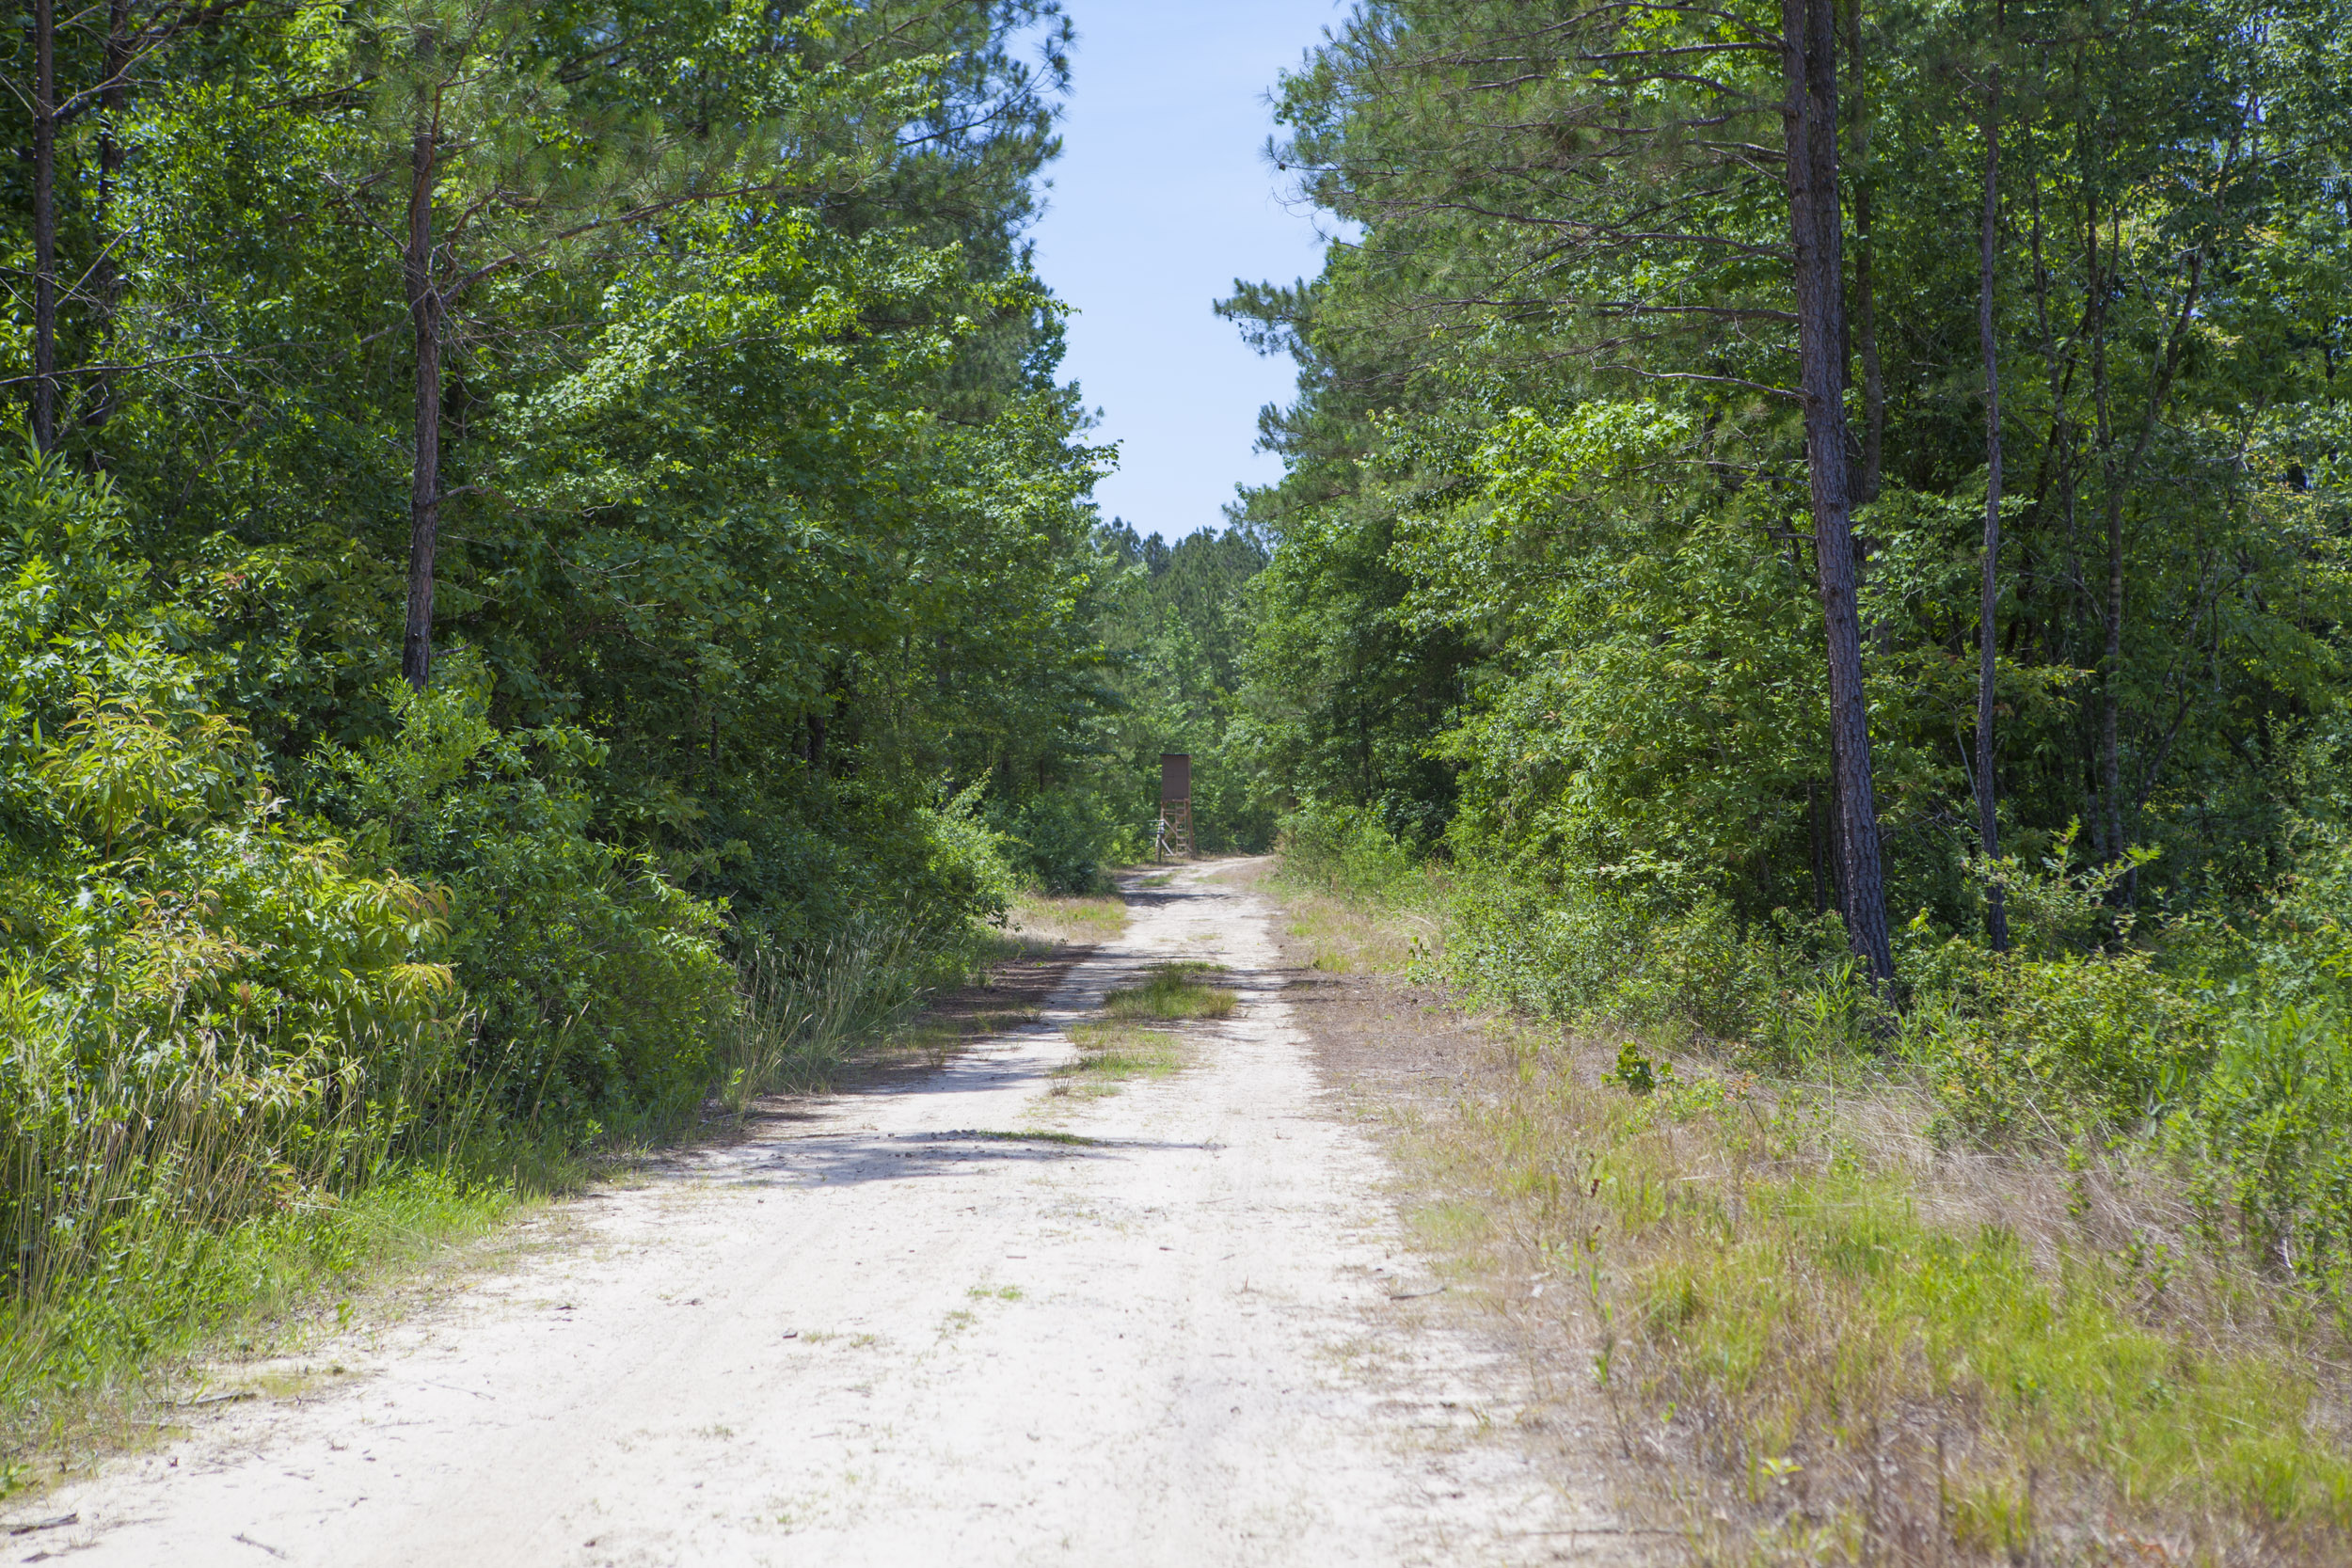 Wilson County Land for Sale near Wilson and Saratoga, NC